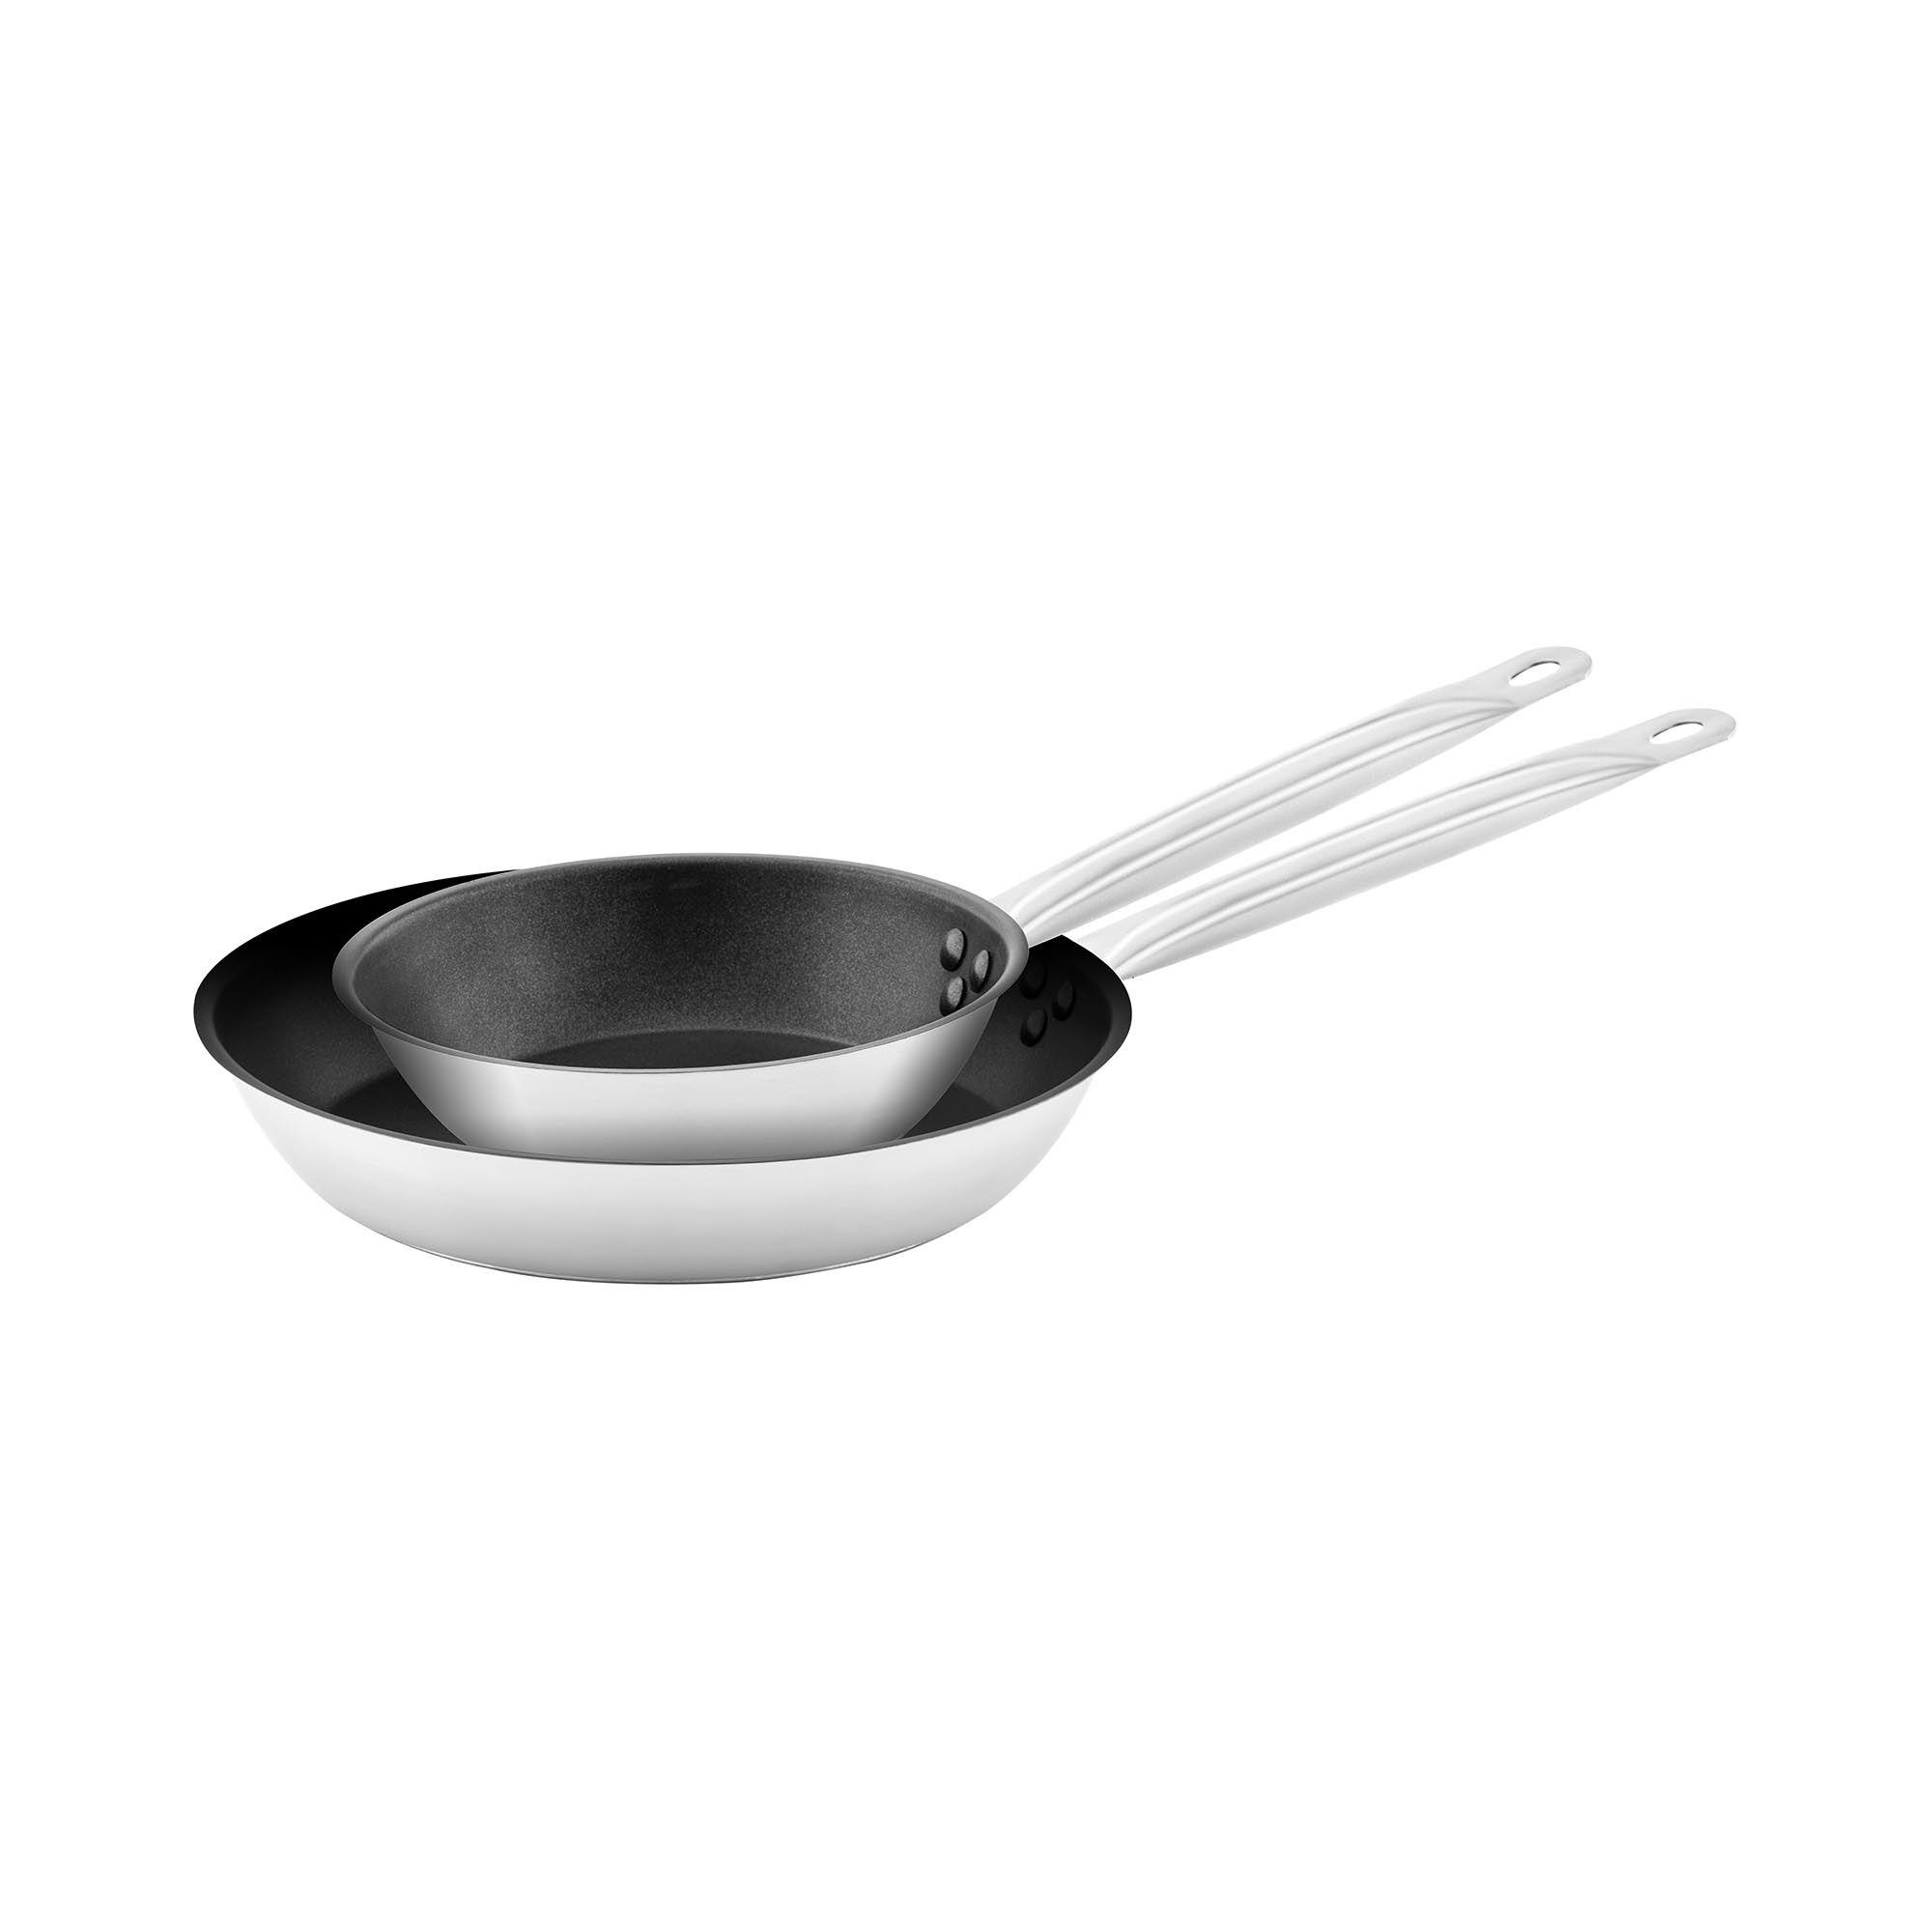 Royal Catering Poêle en inox antiadhésive - Lot de 2 - Ø 20 / 28 x 5 cm